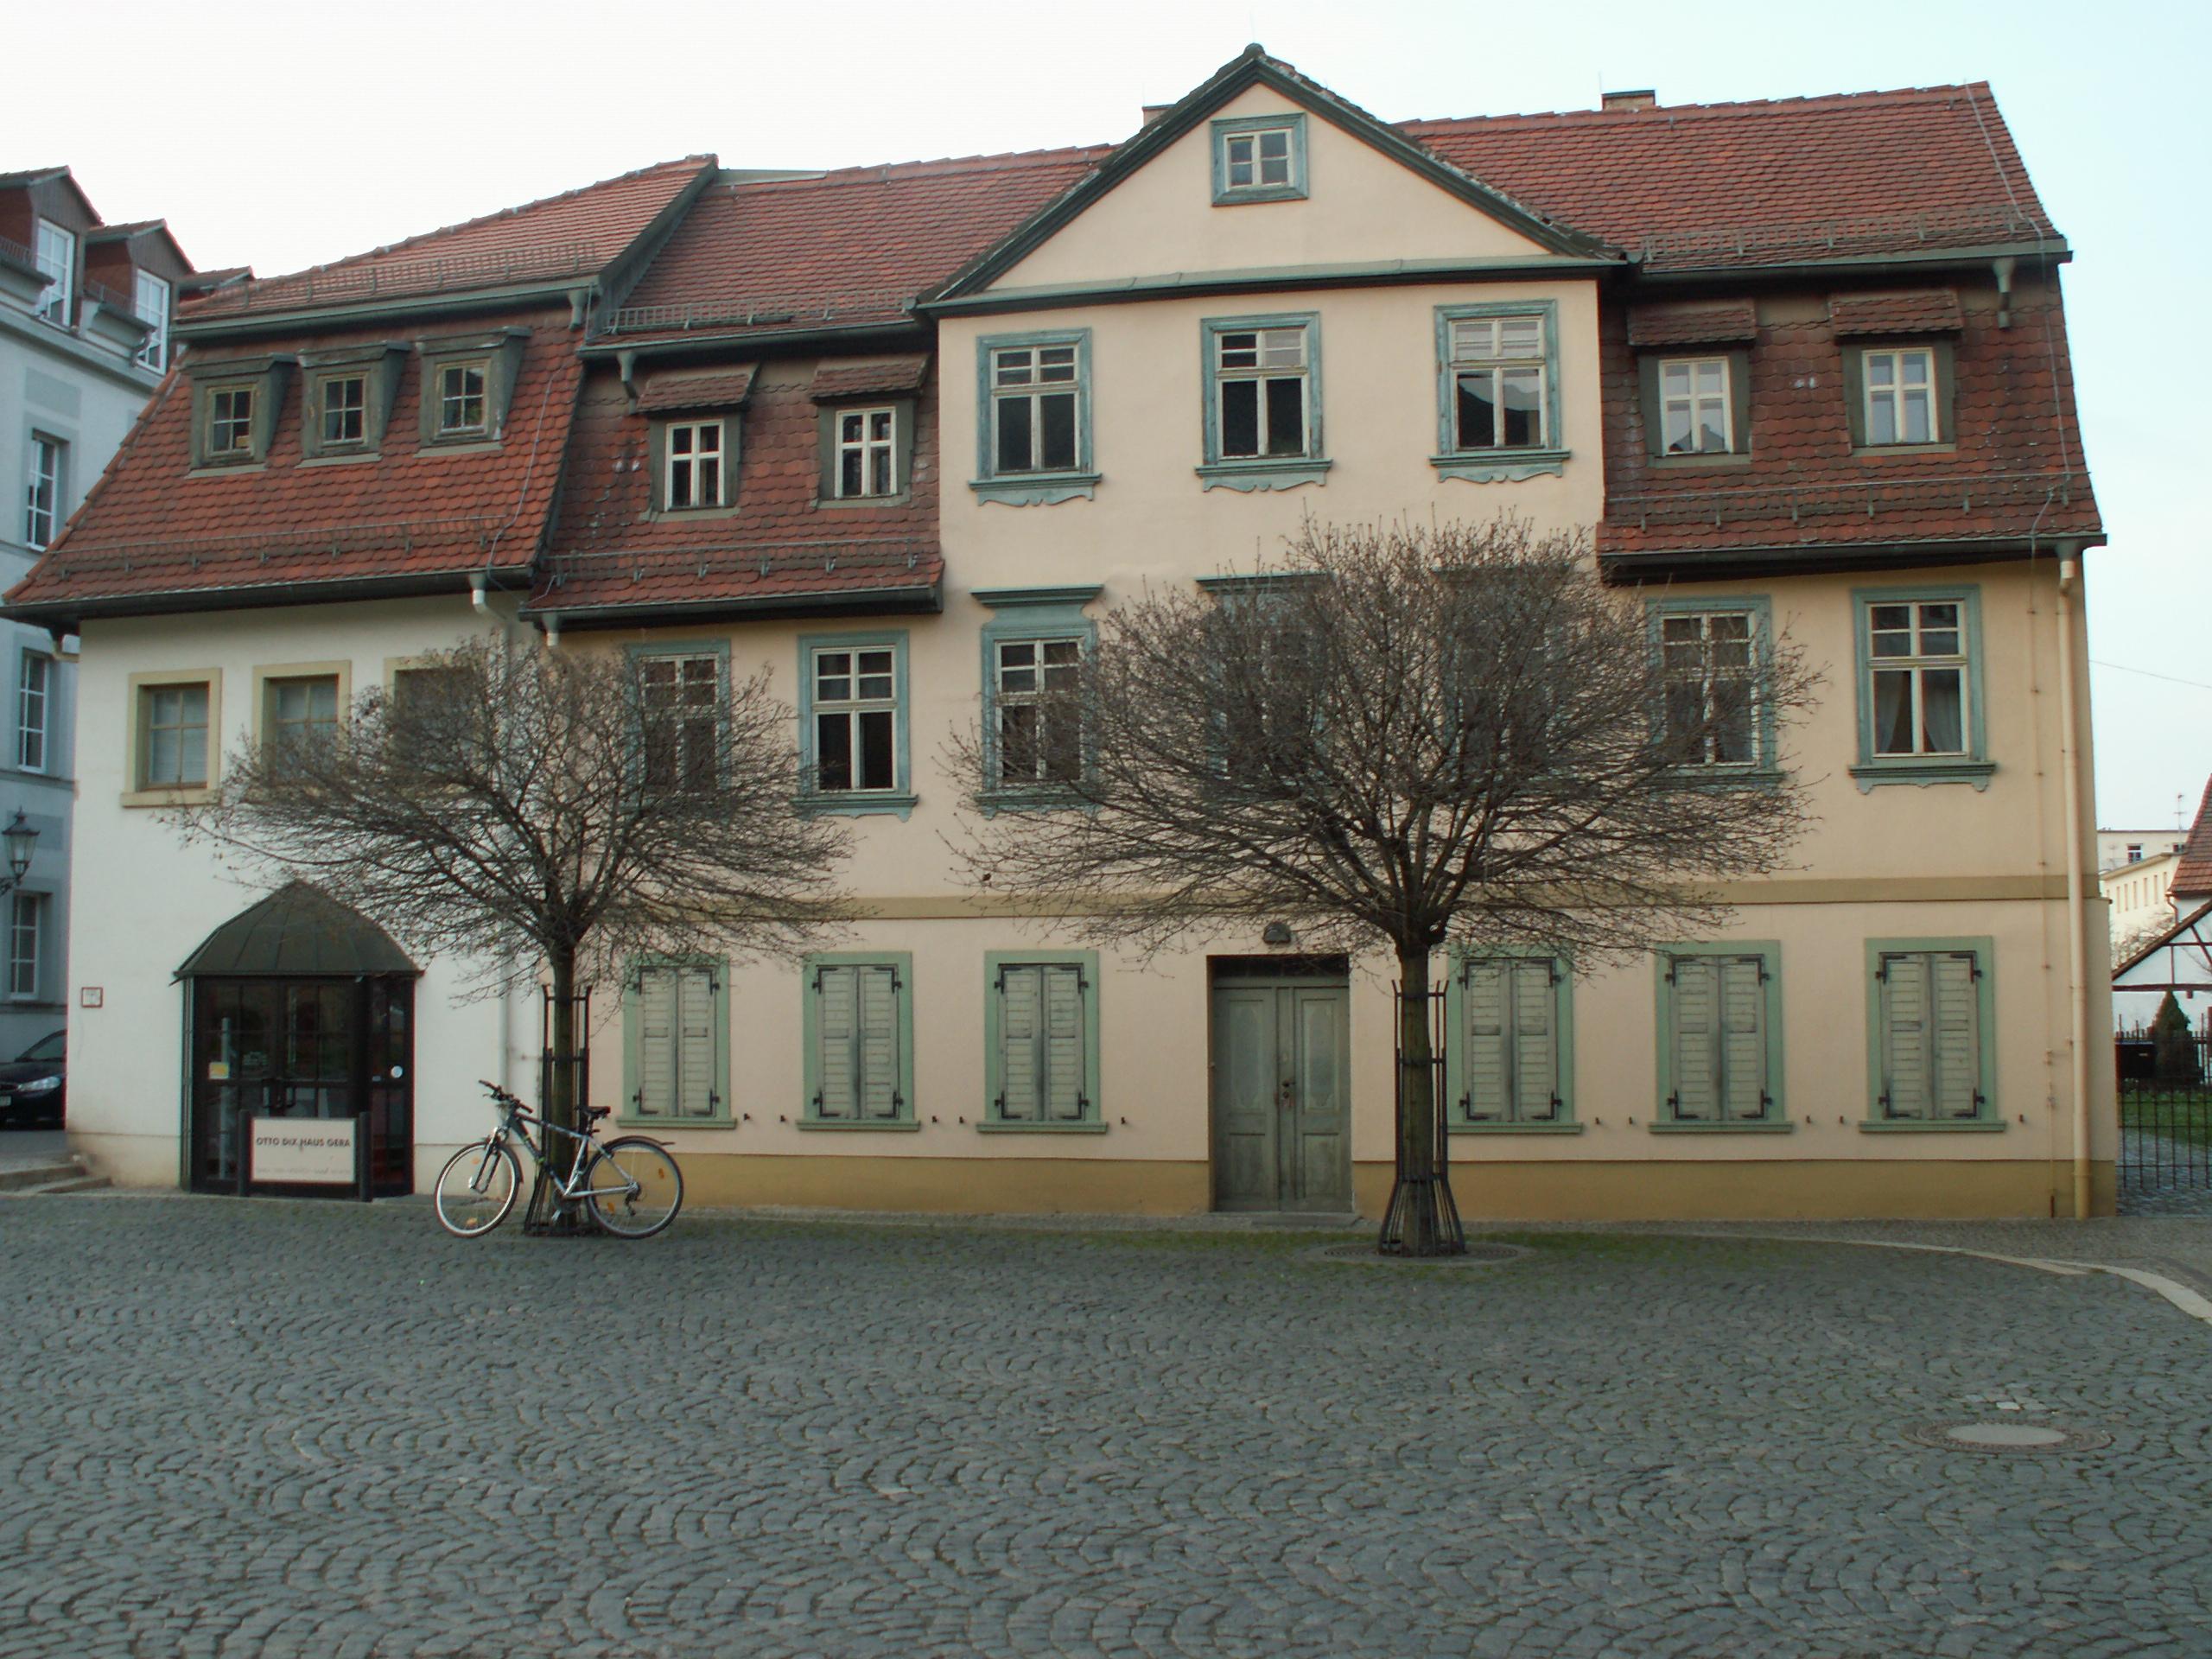 File Gera Otto Dix Haus Wikimedia mons